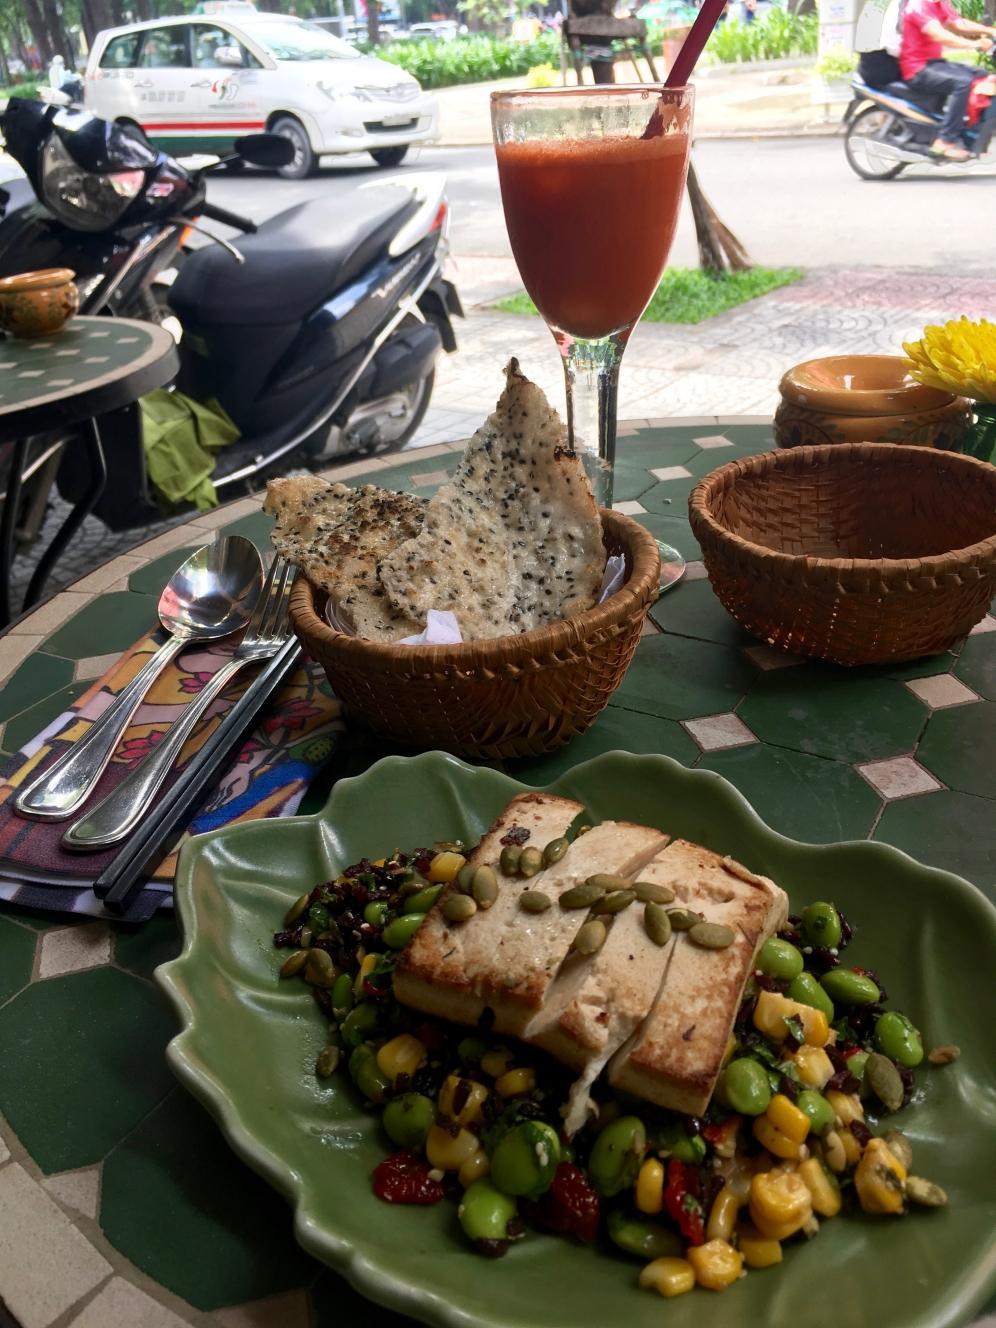 blog-10-25-16-food-11-of-37